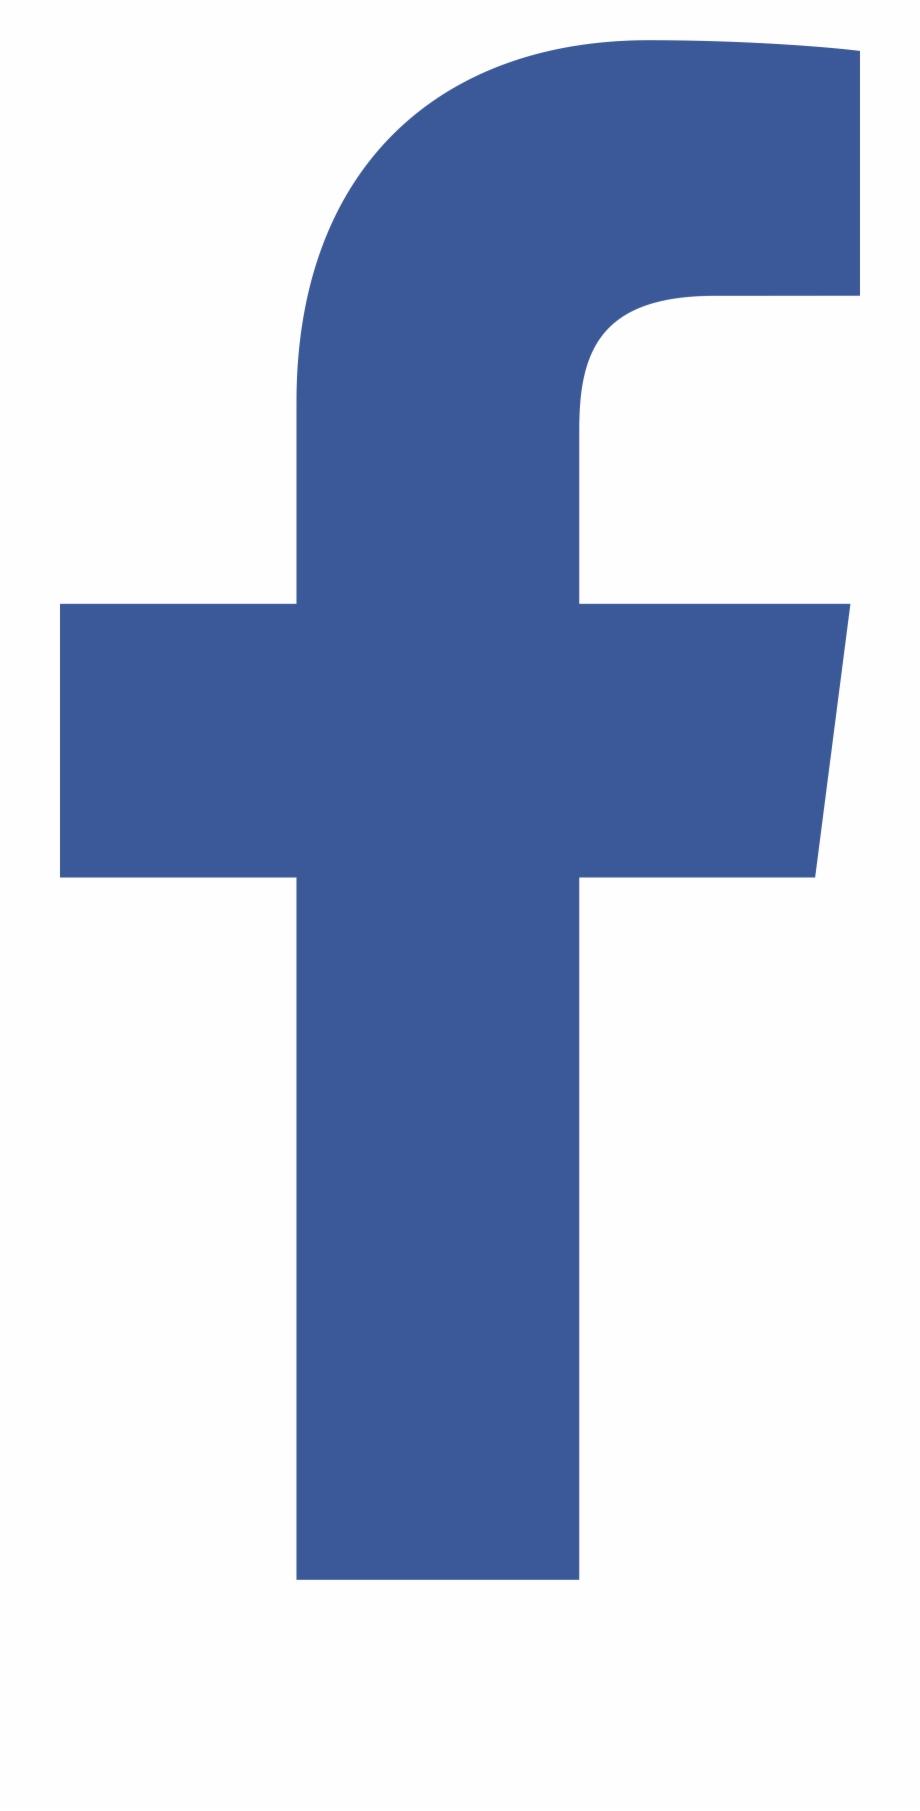 Logo Facebook Png Hd : facebook, Facebook, Transparent, Vector, Library